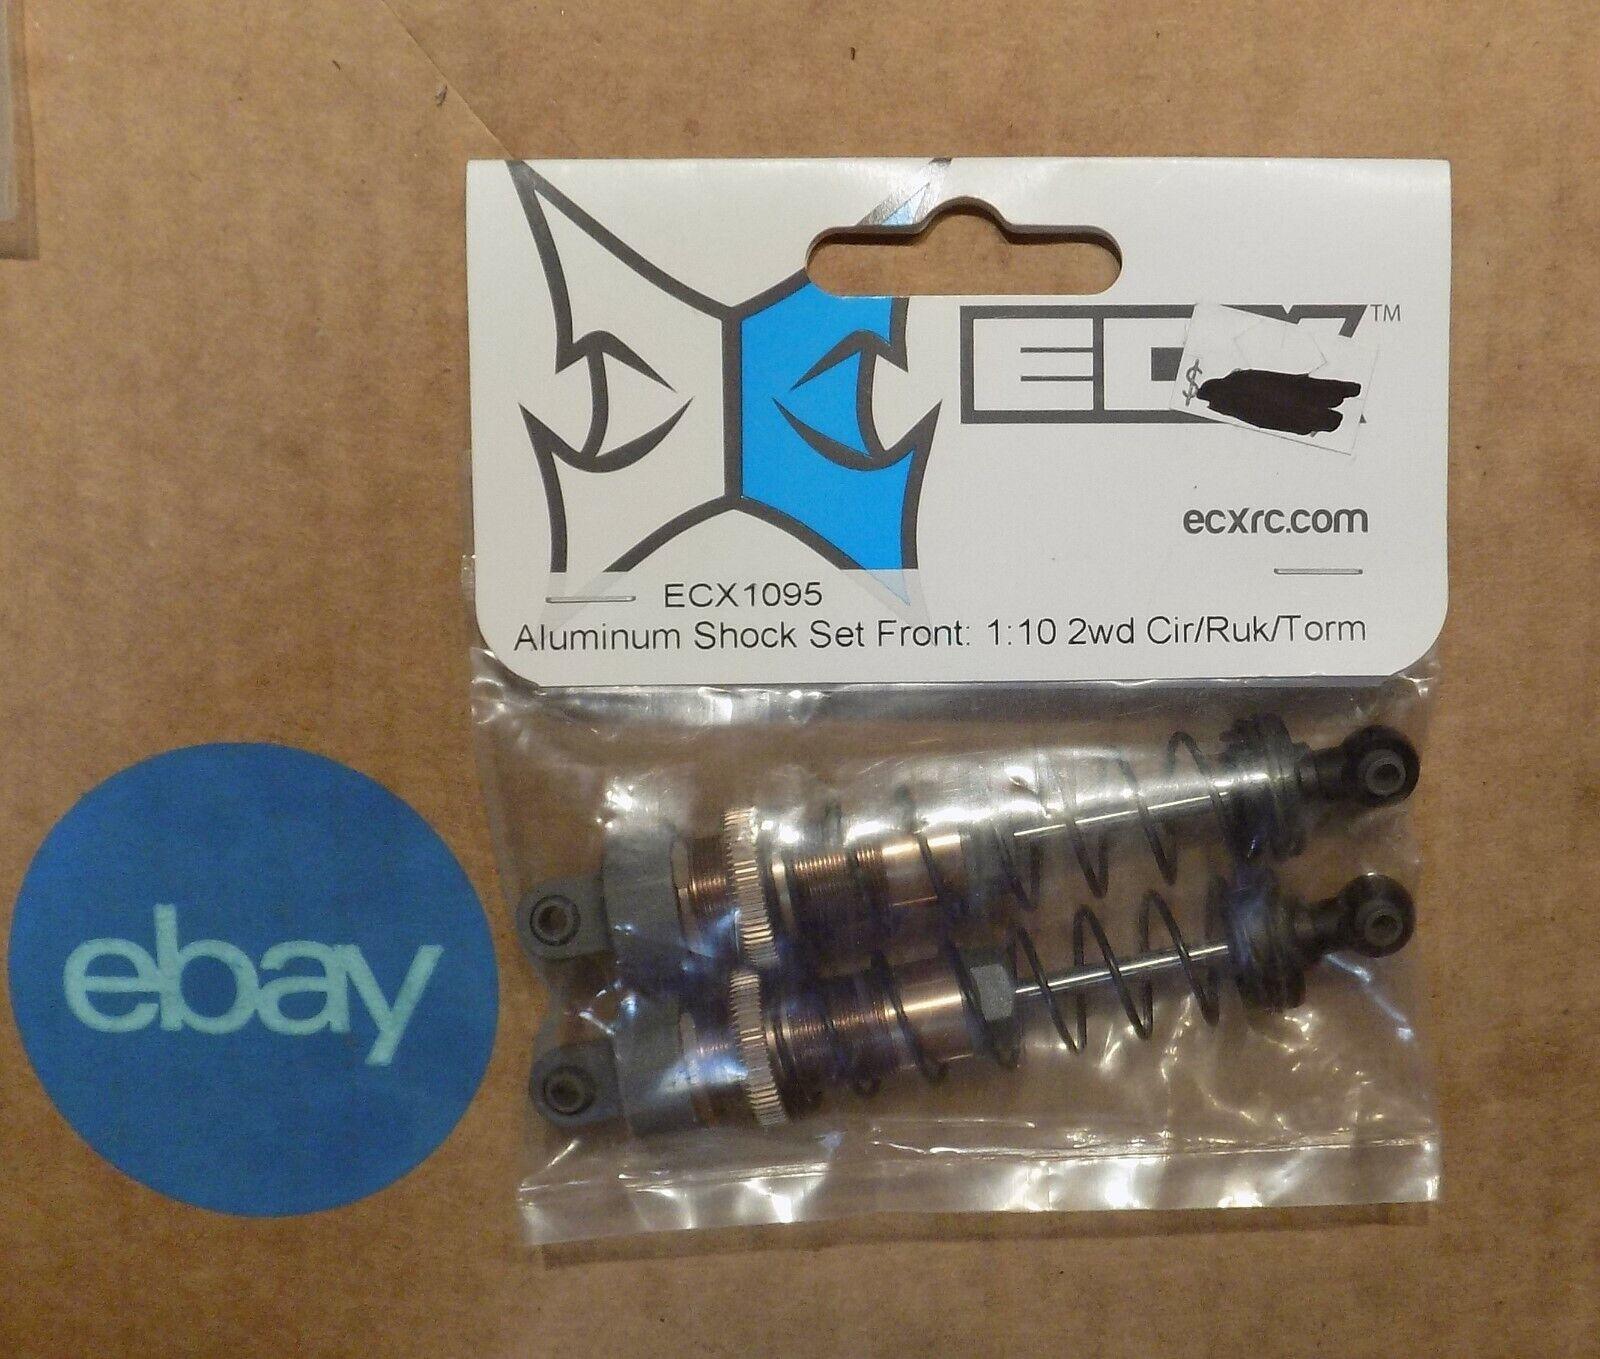 ECX Aluminum Shock Set Rear Z-ECX1096 1:10 2wd Cir//Ruk//Torm